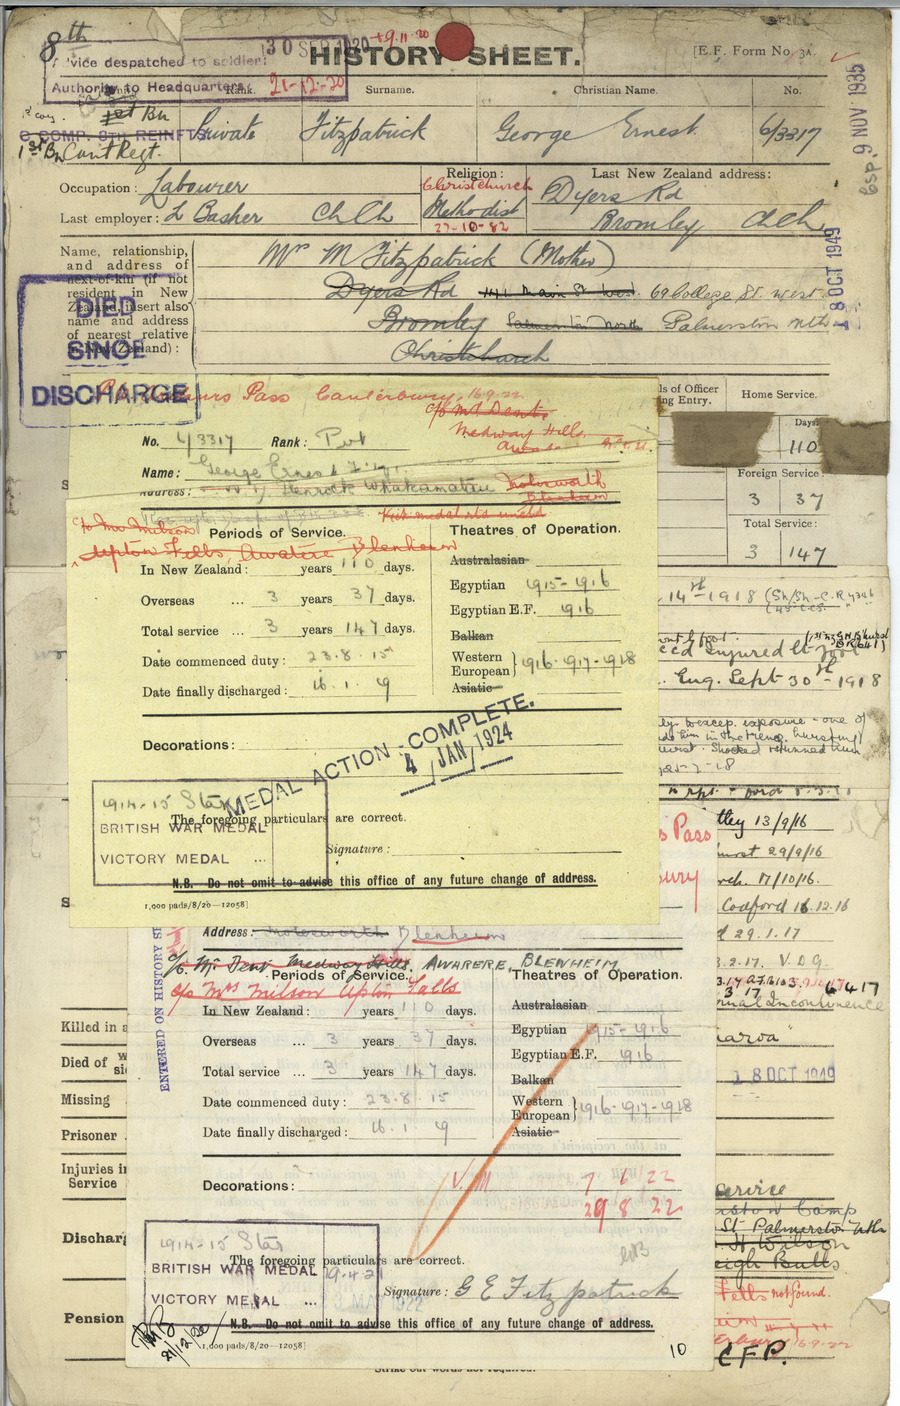 FITZPATRICK, George Ernest - WW1 6/3317 - Army